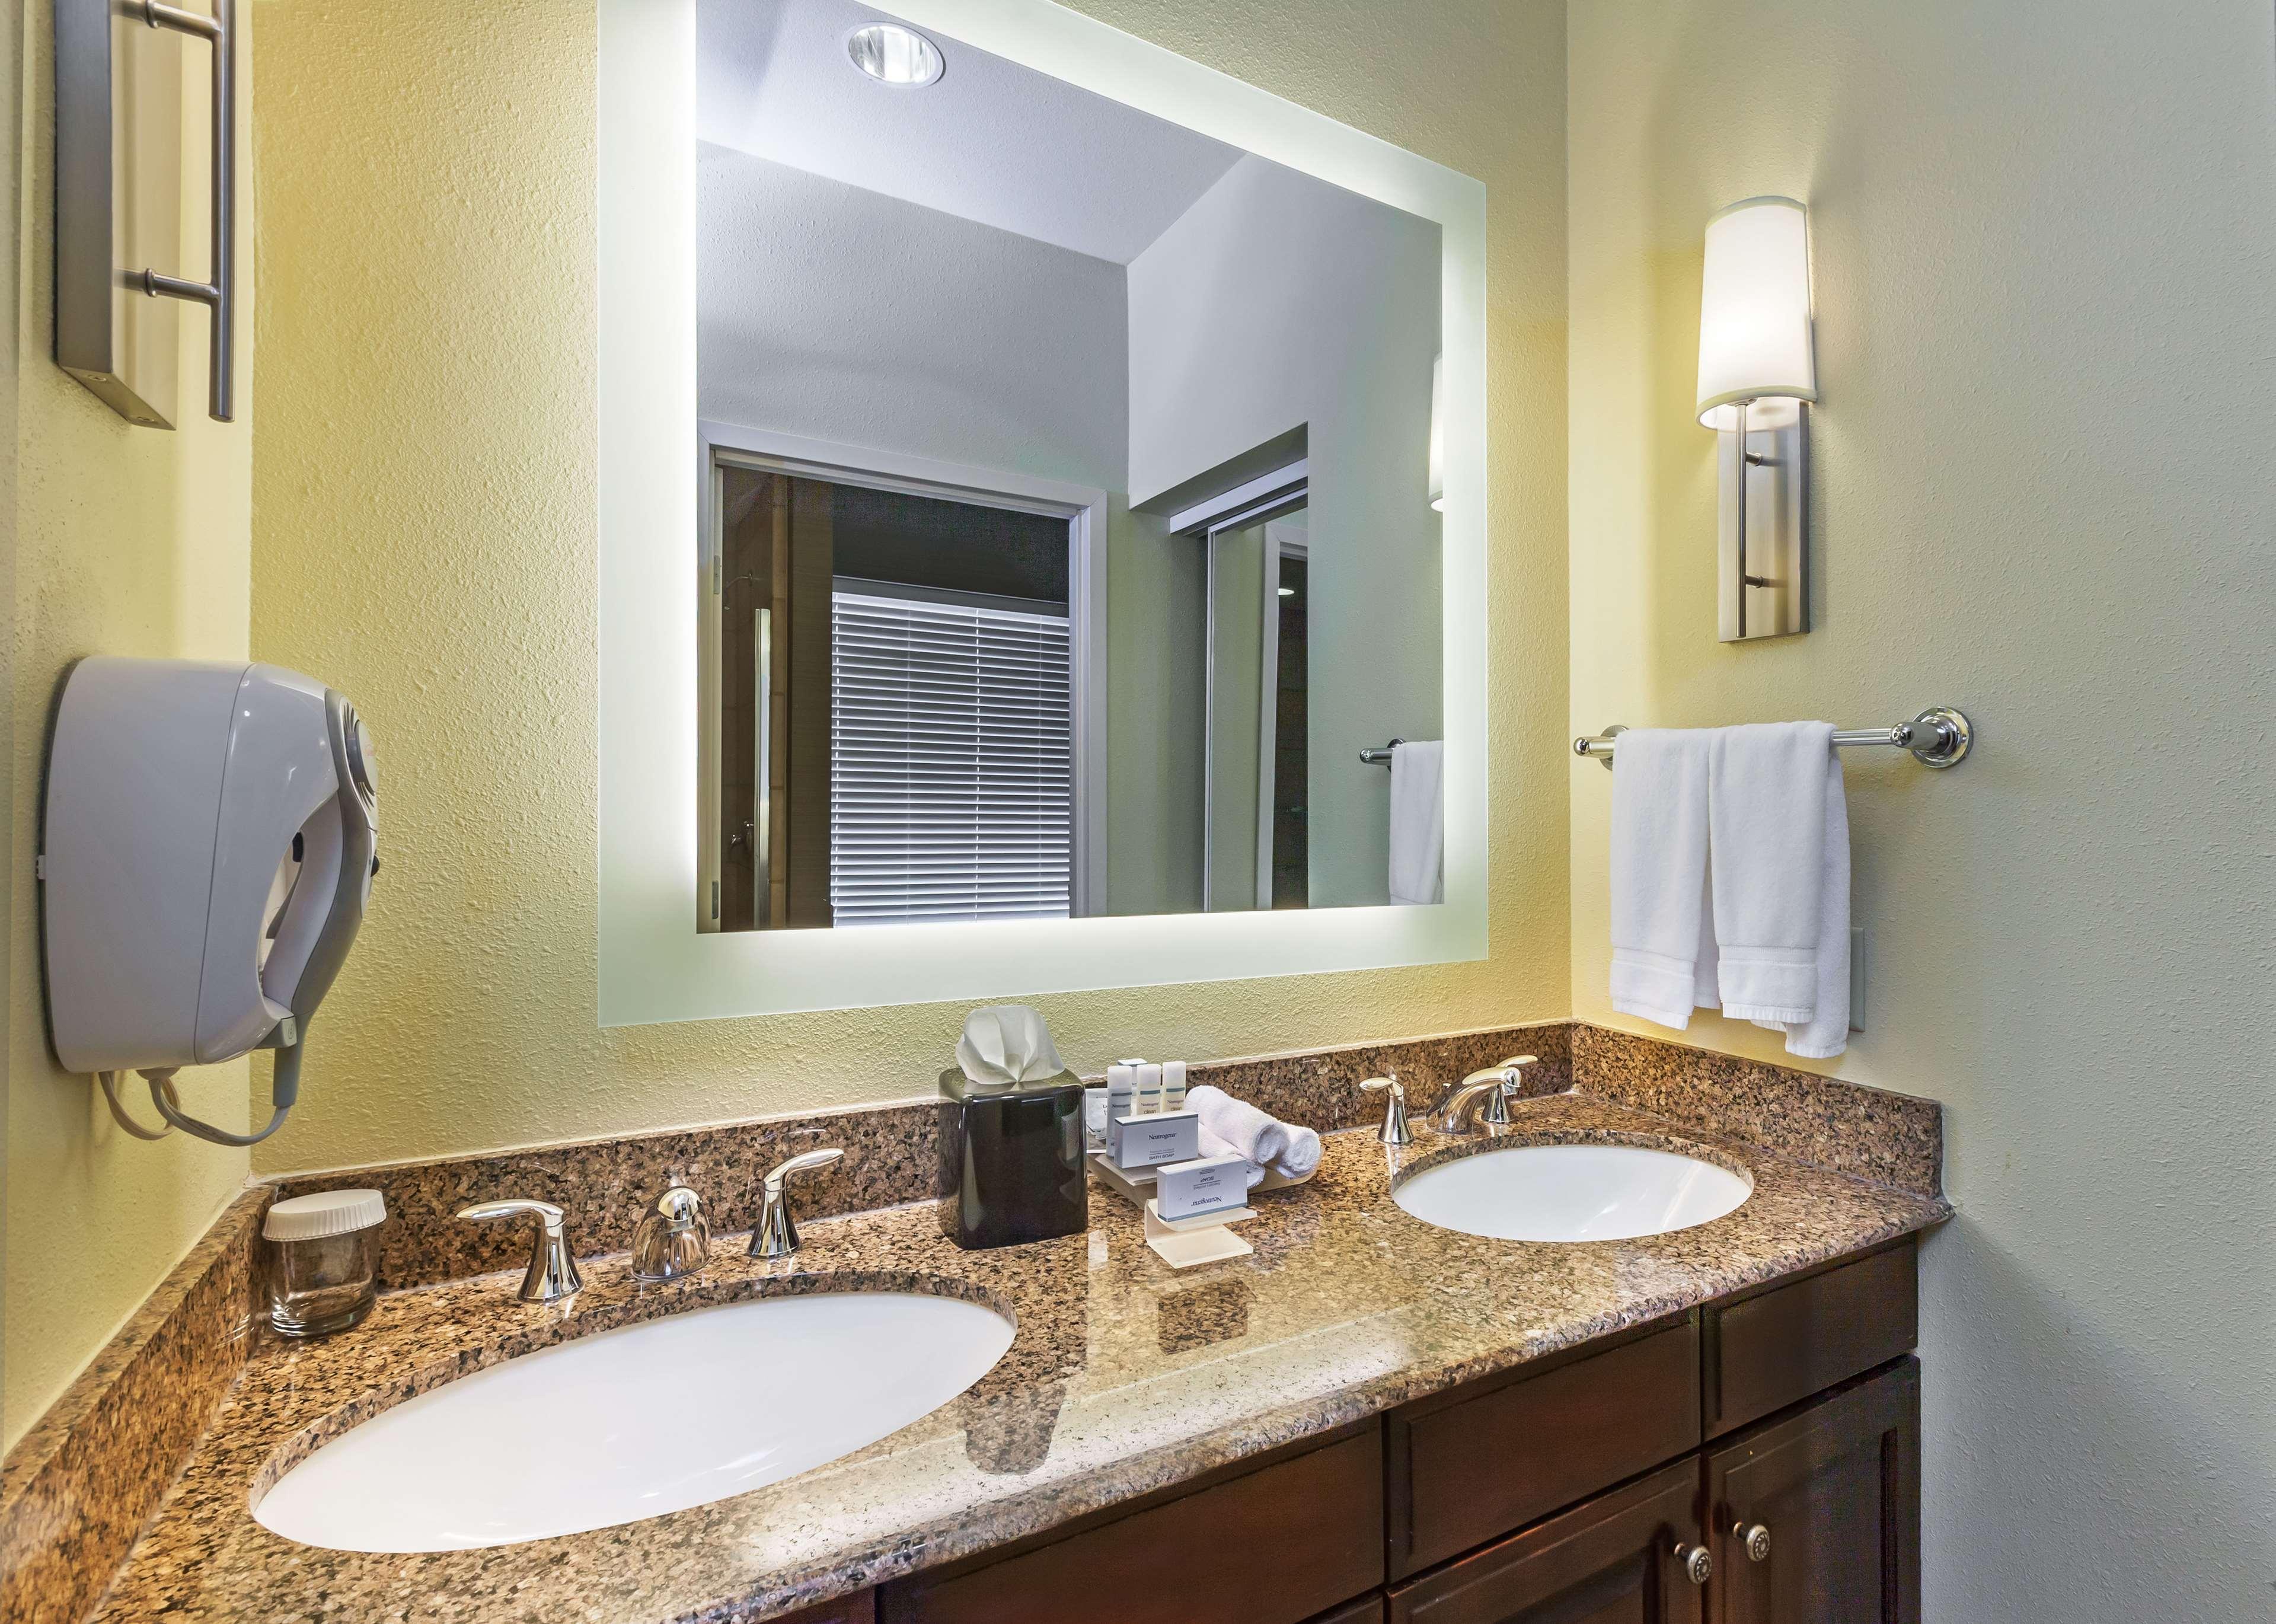 Homewood Suites by Hilton Wichita Falls image 15